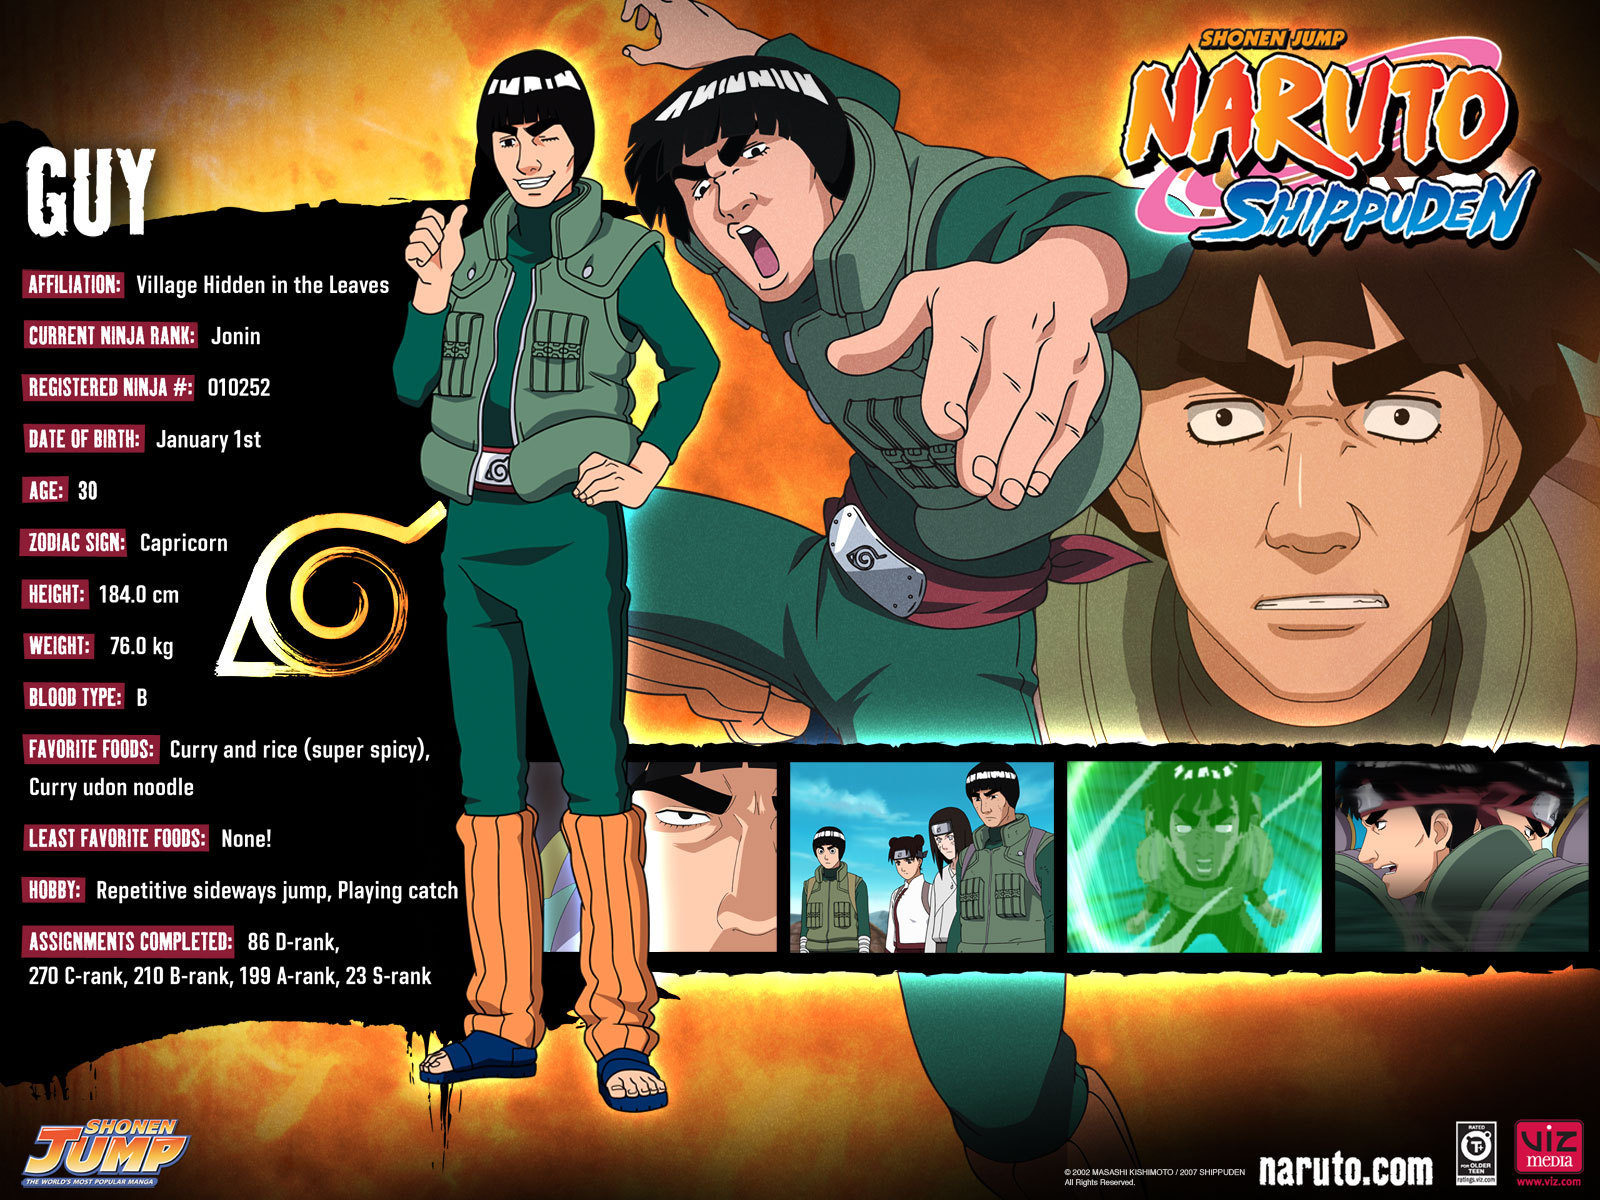 Naruto Shippuden HD Wallpaper Image for iPad Cartoons